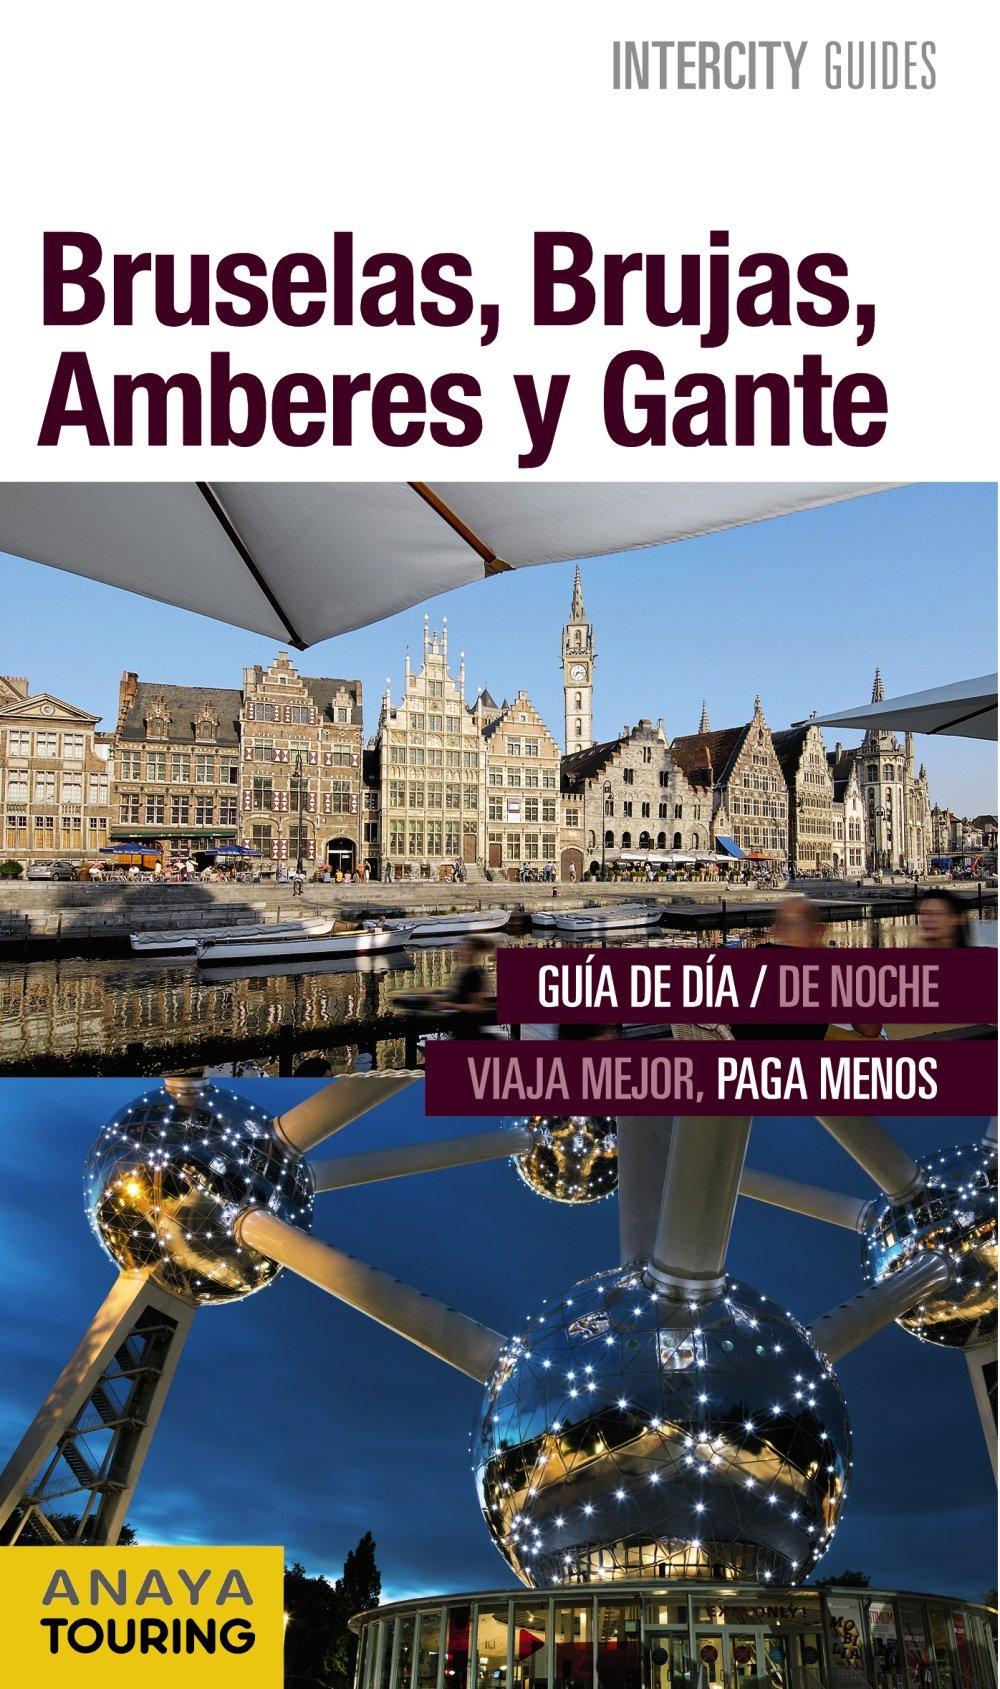 Bruselas Brujas Amberes Y Gante Intercity Guides Internacional Spanish Edition Anaya Touring Martín Aparicio Galo 9788499358024 Books